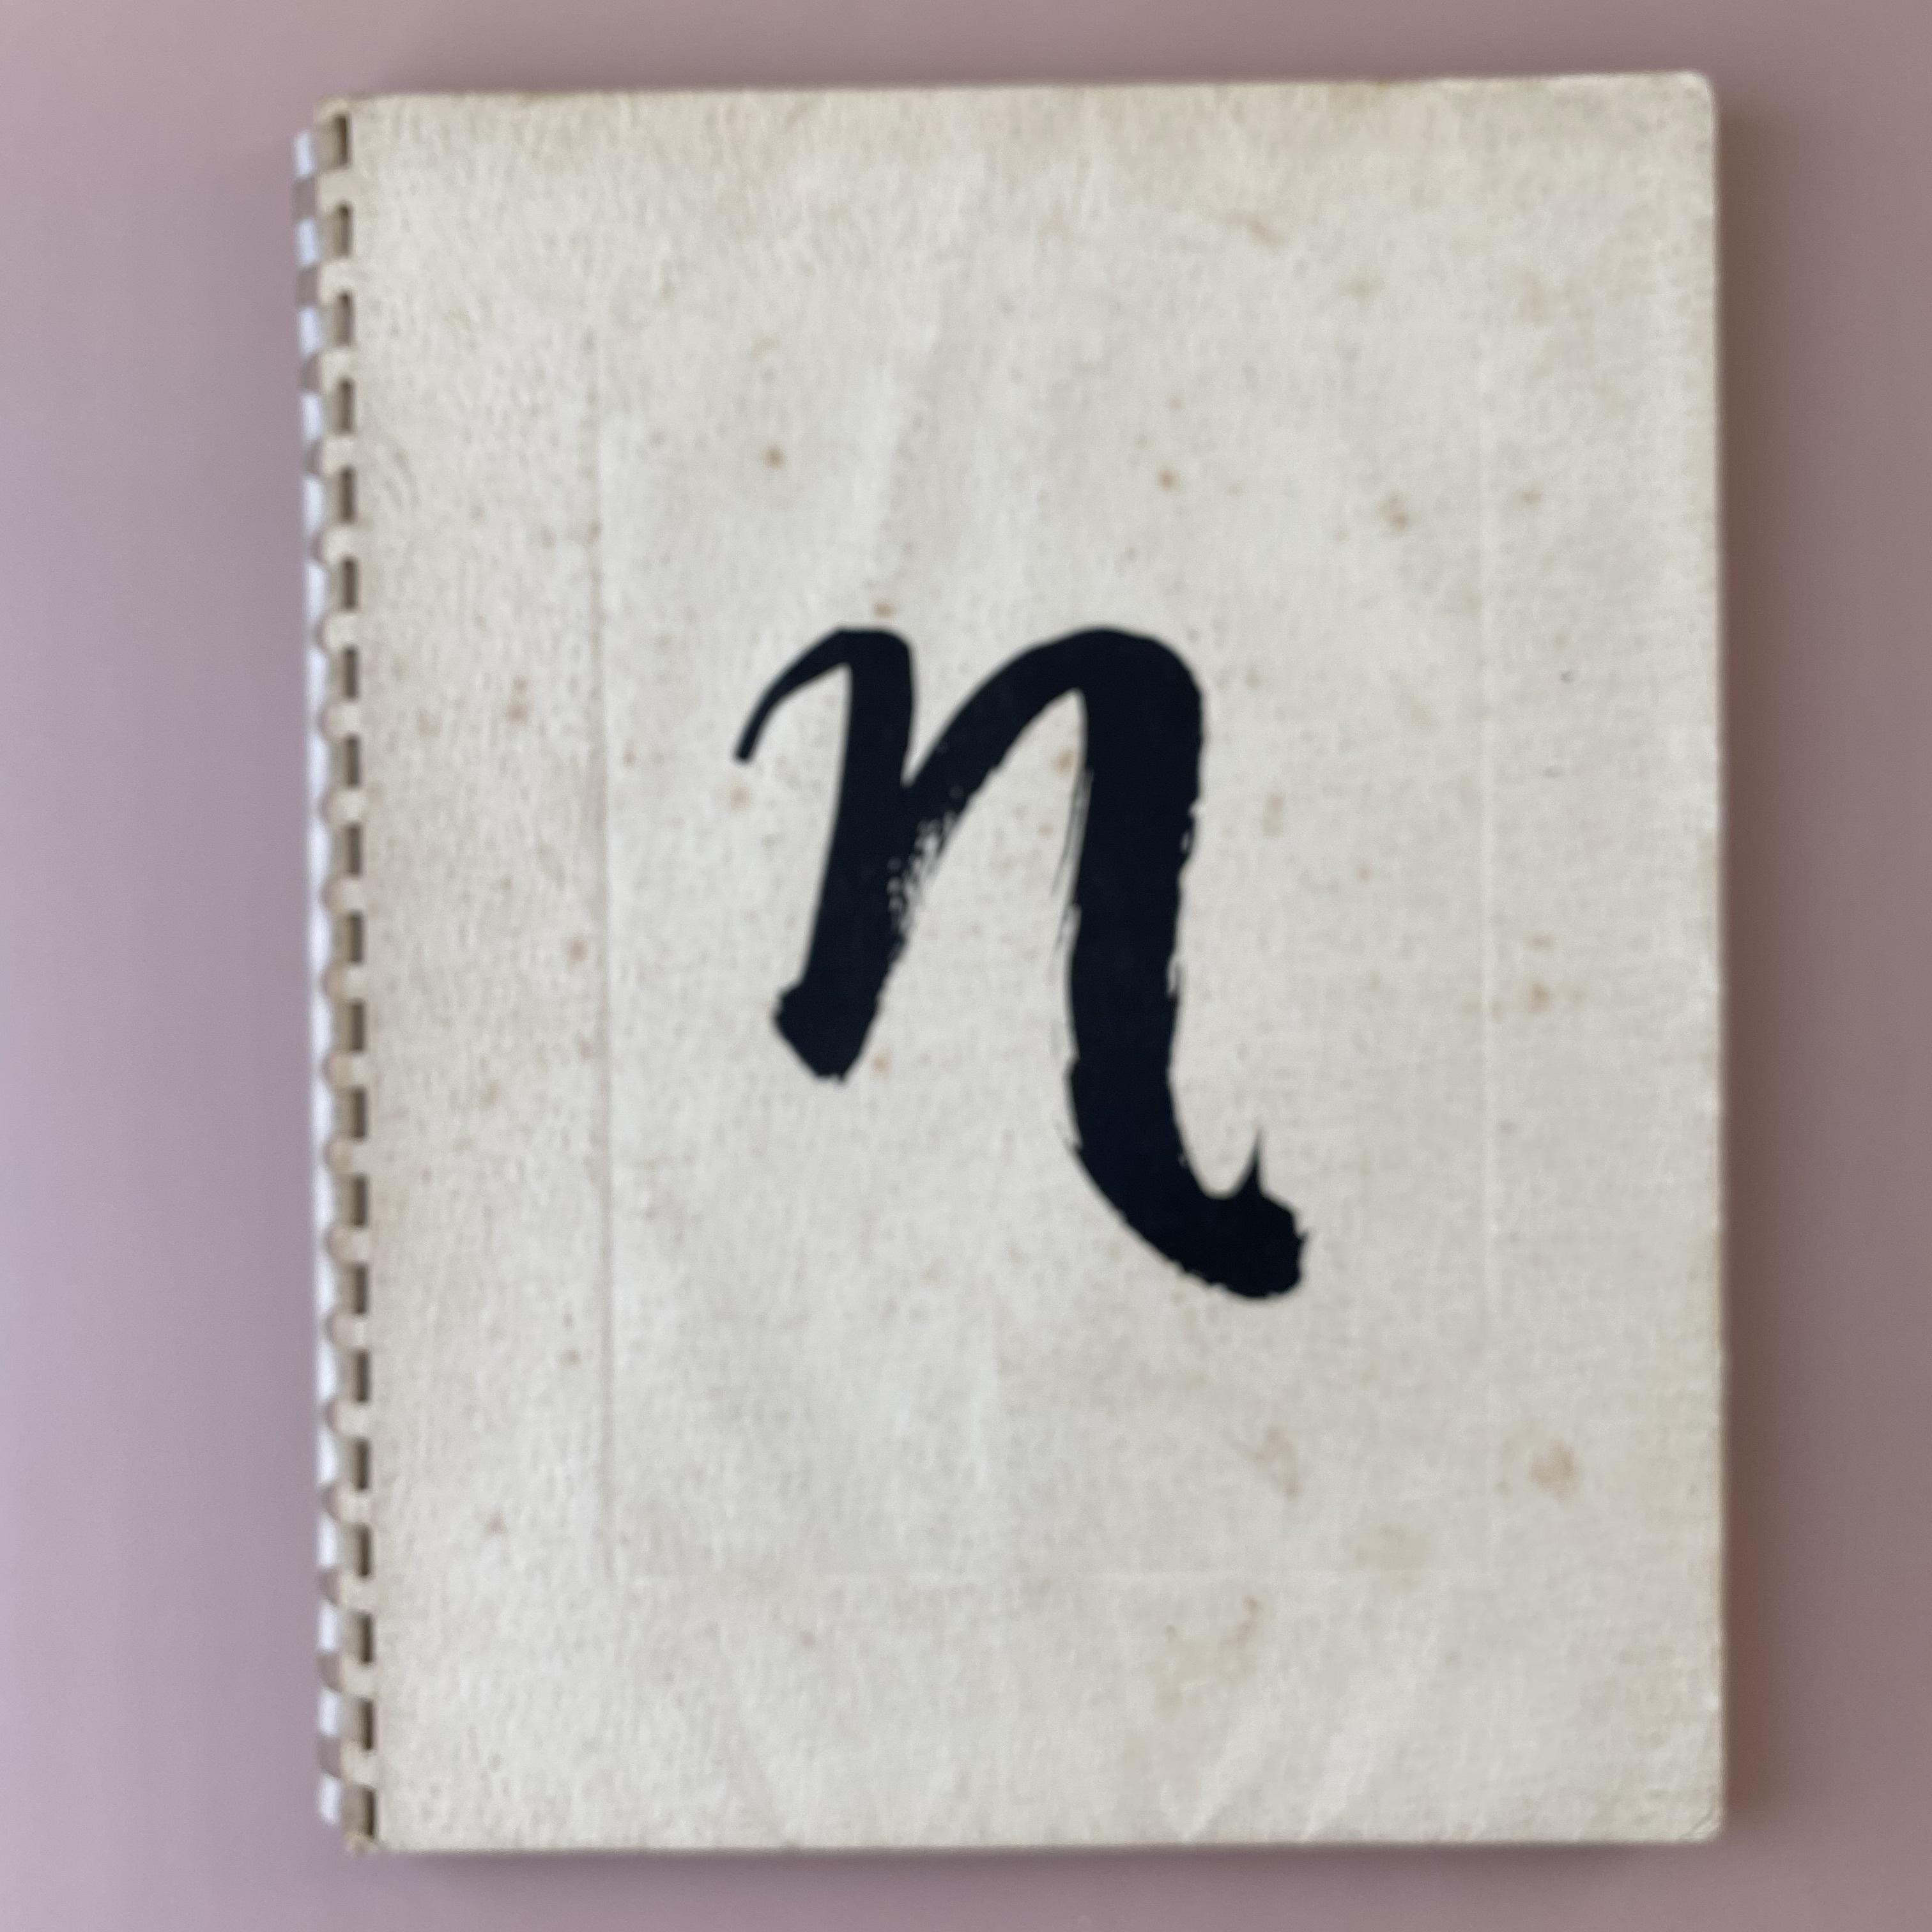 VINS NICOLAS CATALOGUE 1939・C.ERICKSON / vp0100